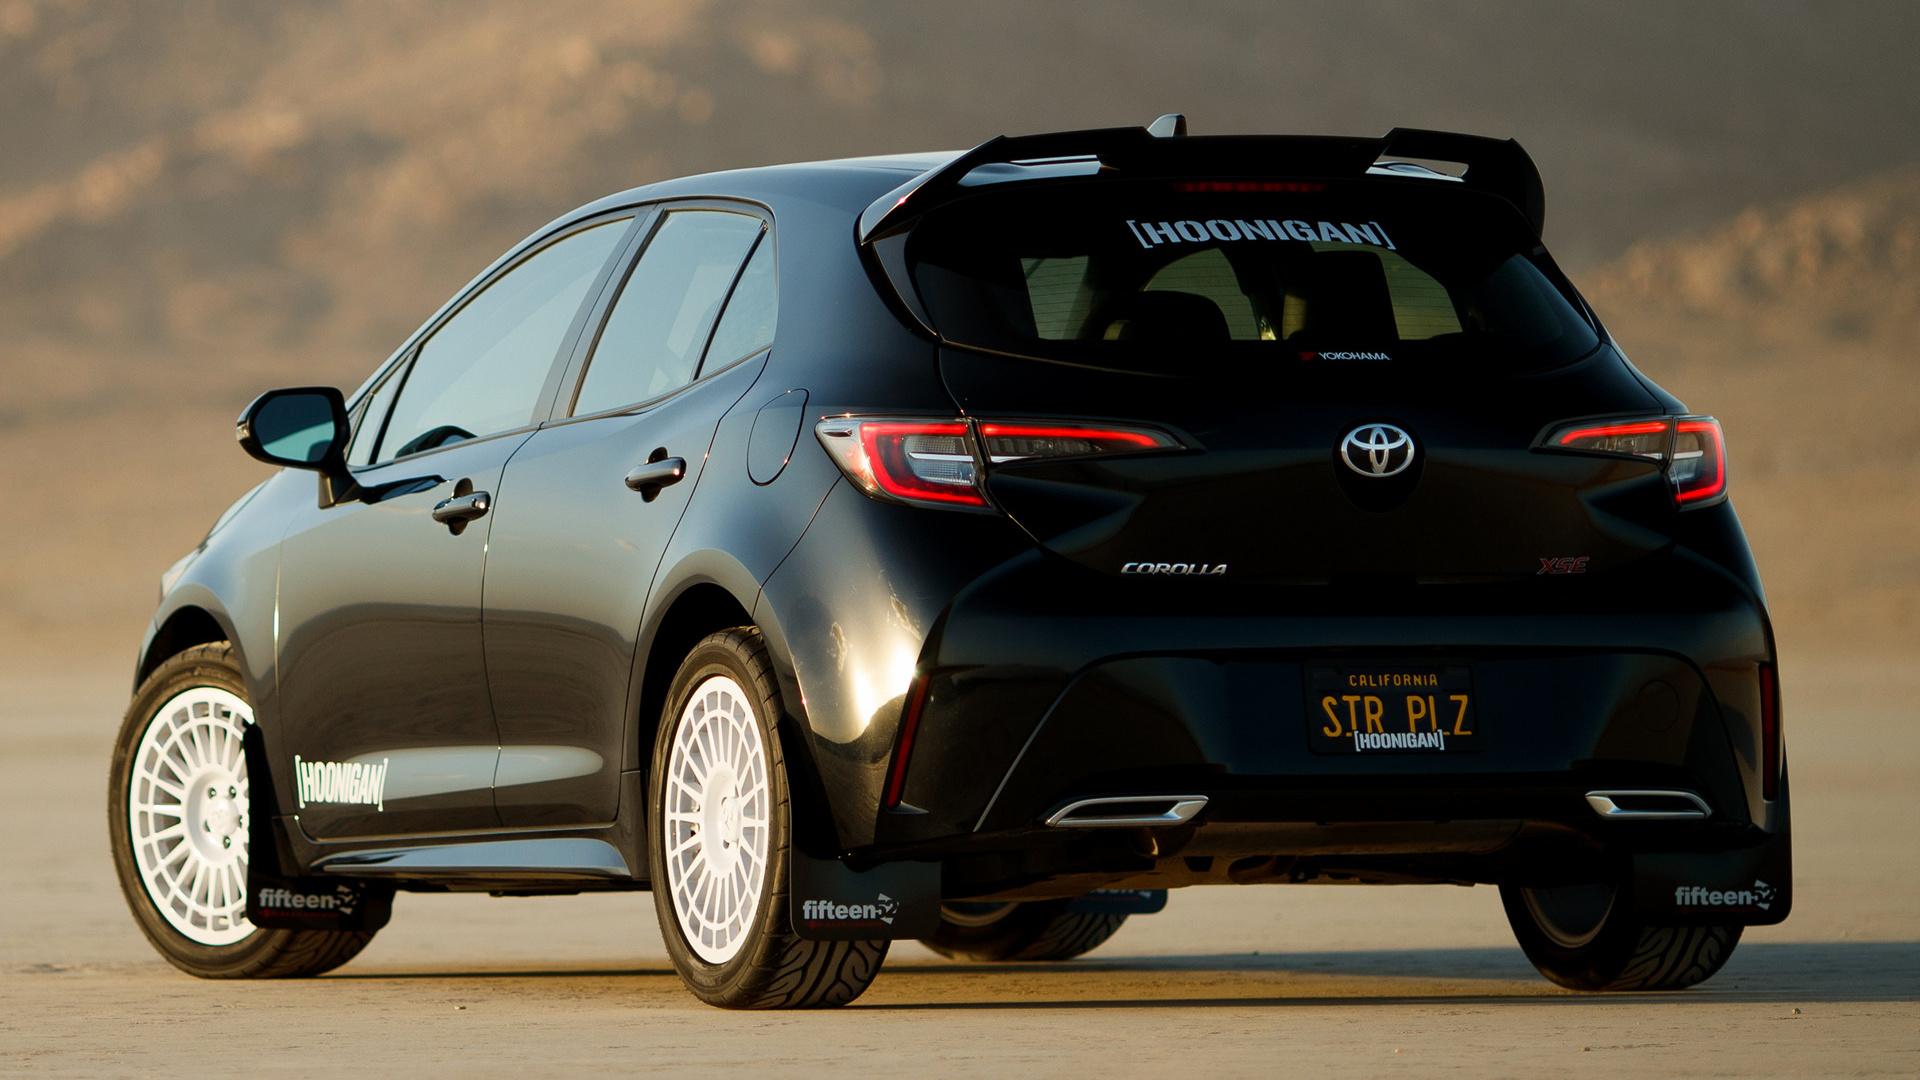 2018 Toyota Corolla Hoonigan - Toyota Corolla Tuning 2019 , HD Wallpaper & Backgrounds